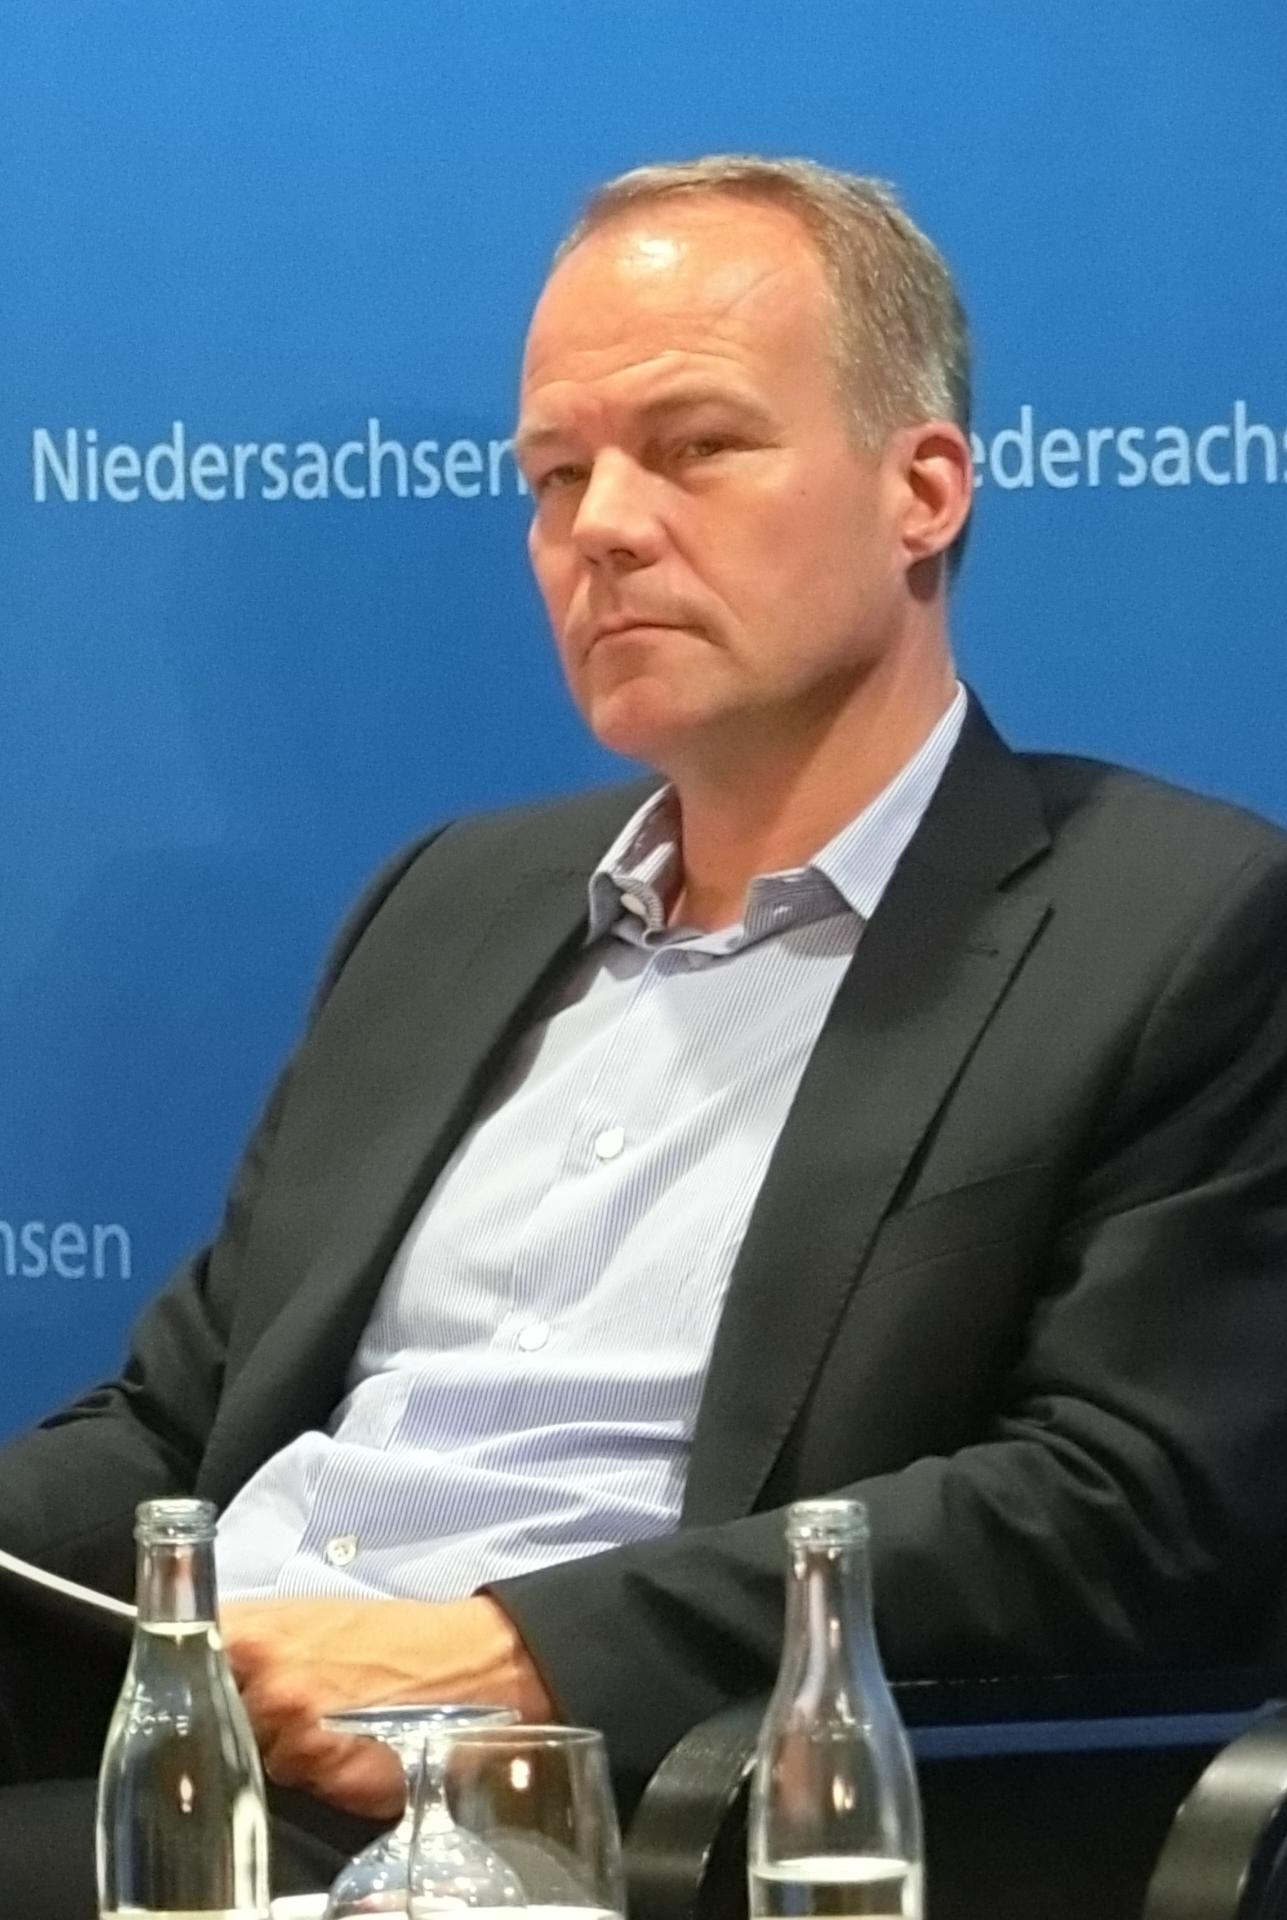 matthias-miersch-foto-gerhard-hofmann-agentur-zukunft-fuer-solarify